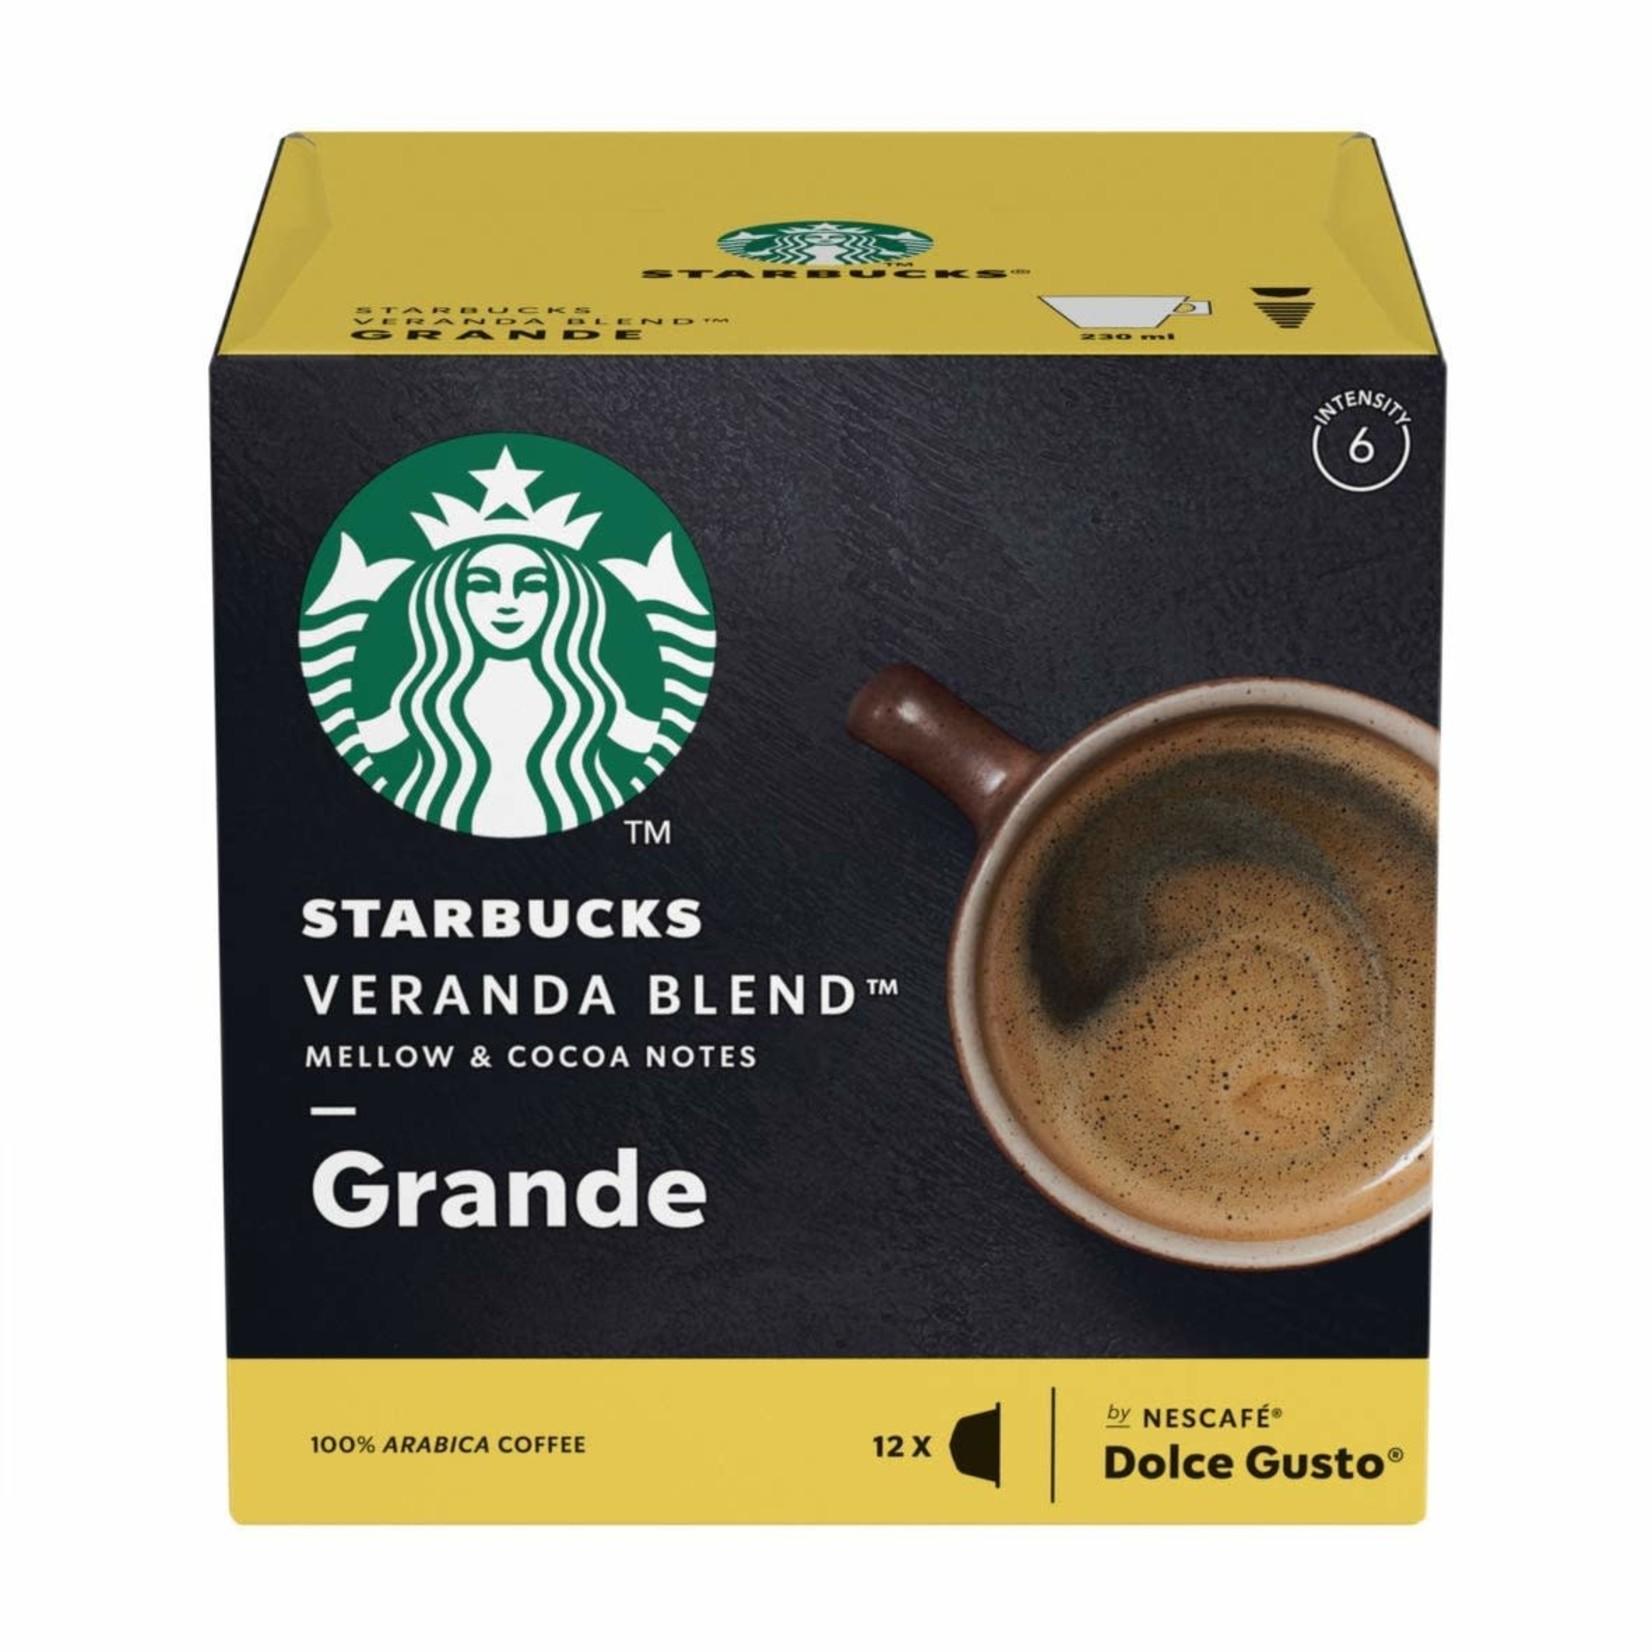 Nescafe Dolce Gusto Starbucks Veranda Blend Grande 12 Pods